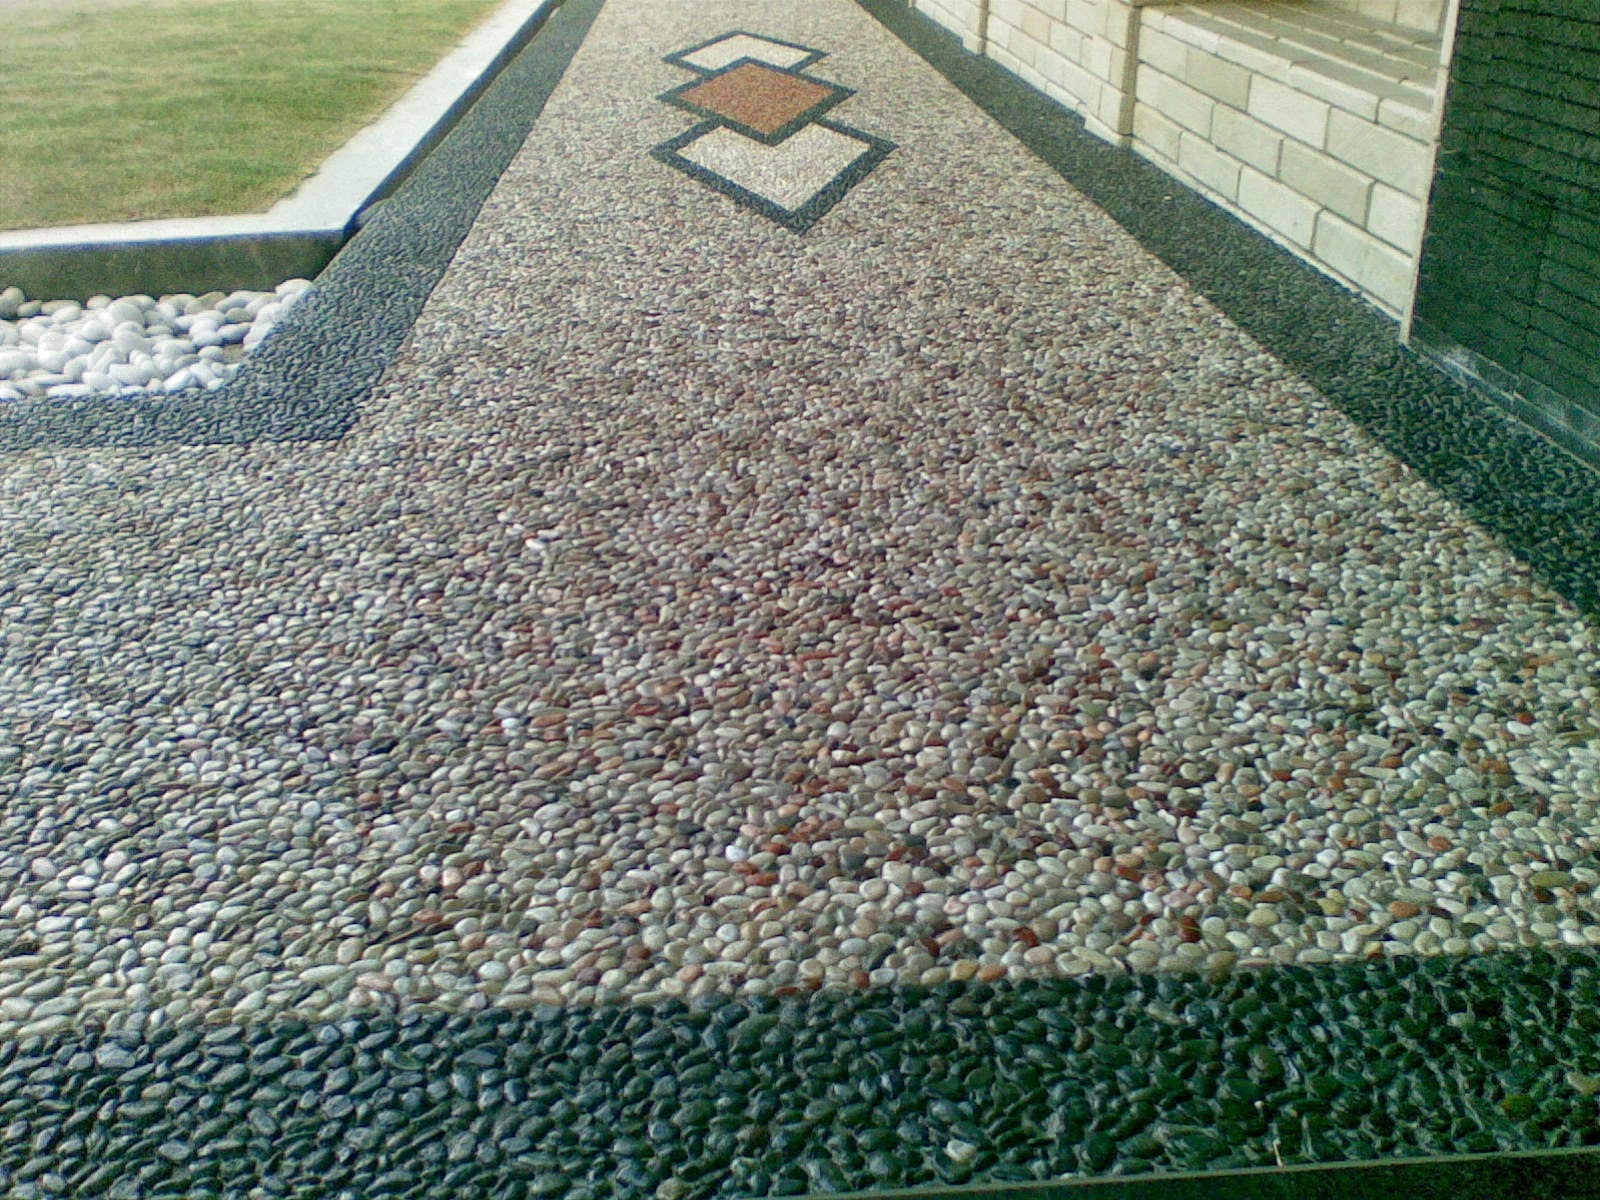 http://tukangtamanqu.blogspot.com/2014/12/pembuatan-taman-carpot-batu-sikat-koral.html